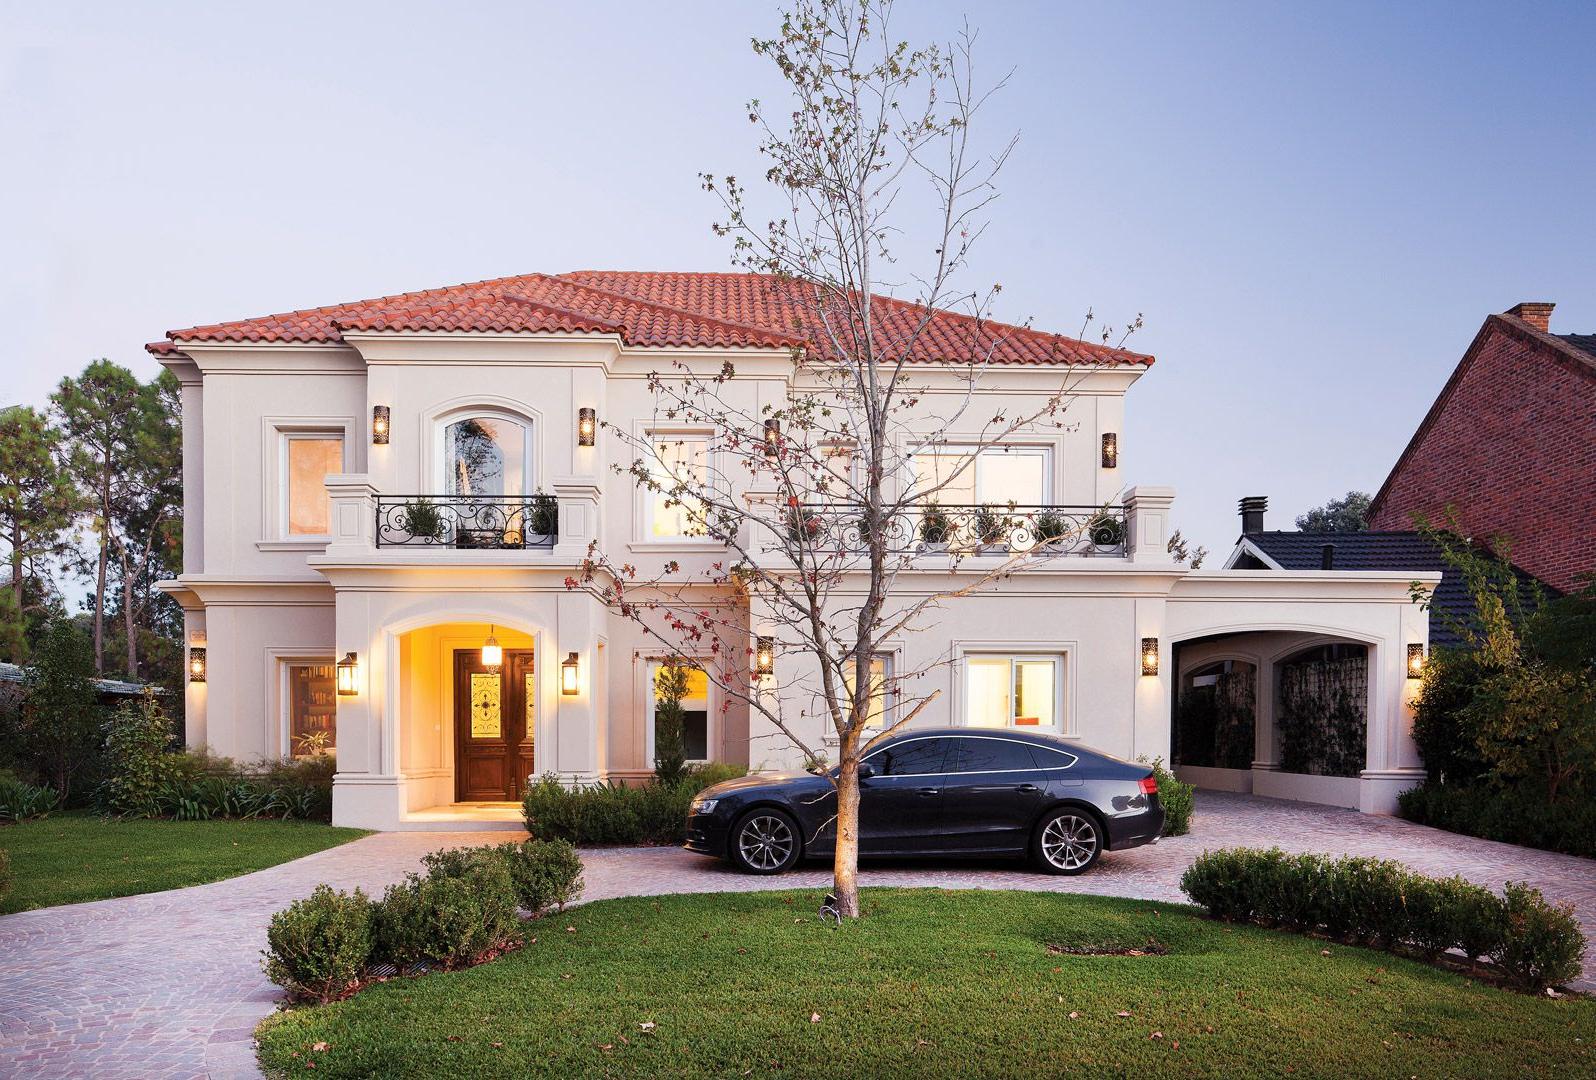 Grande maison belle et moderne